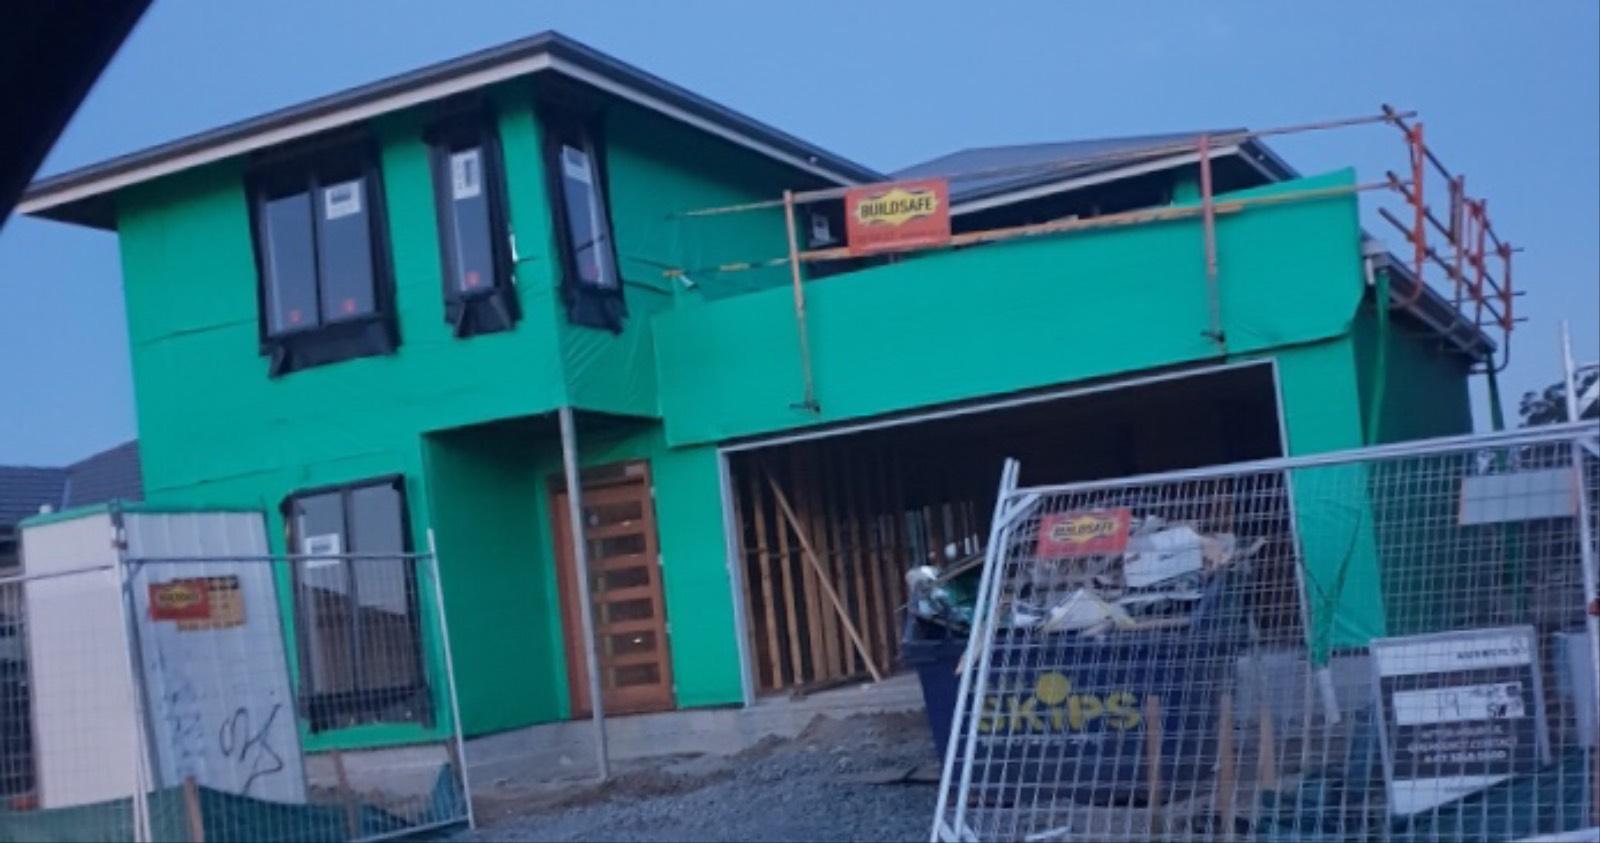 Building with Ausbuild @ Bridgeman Downs